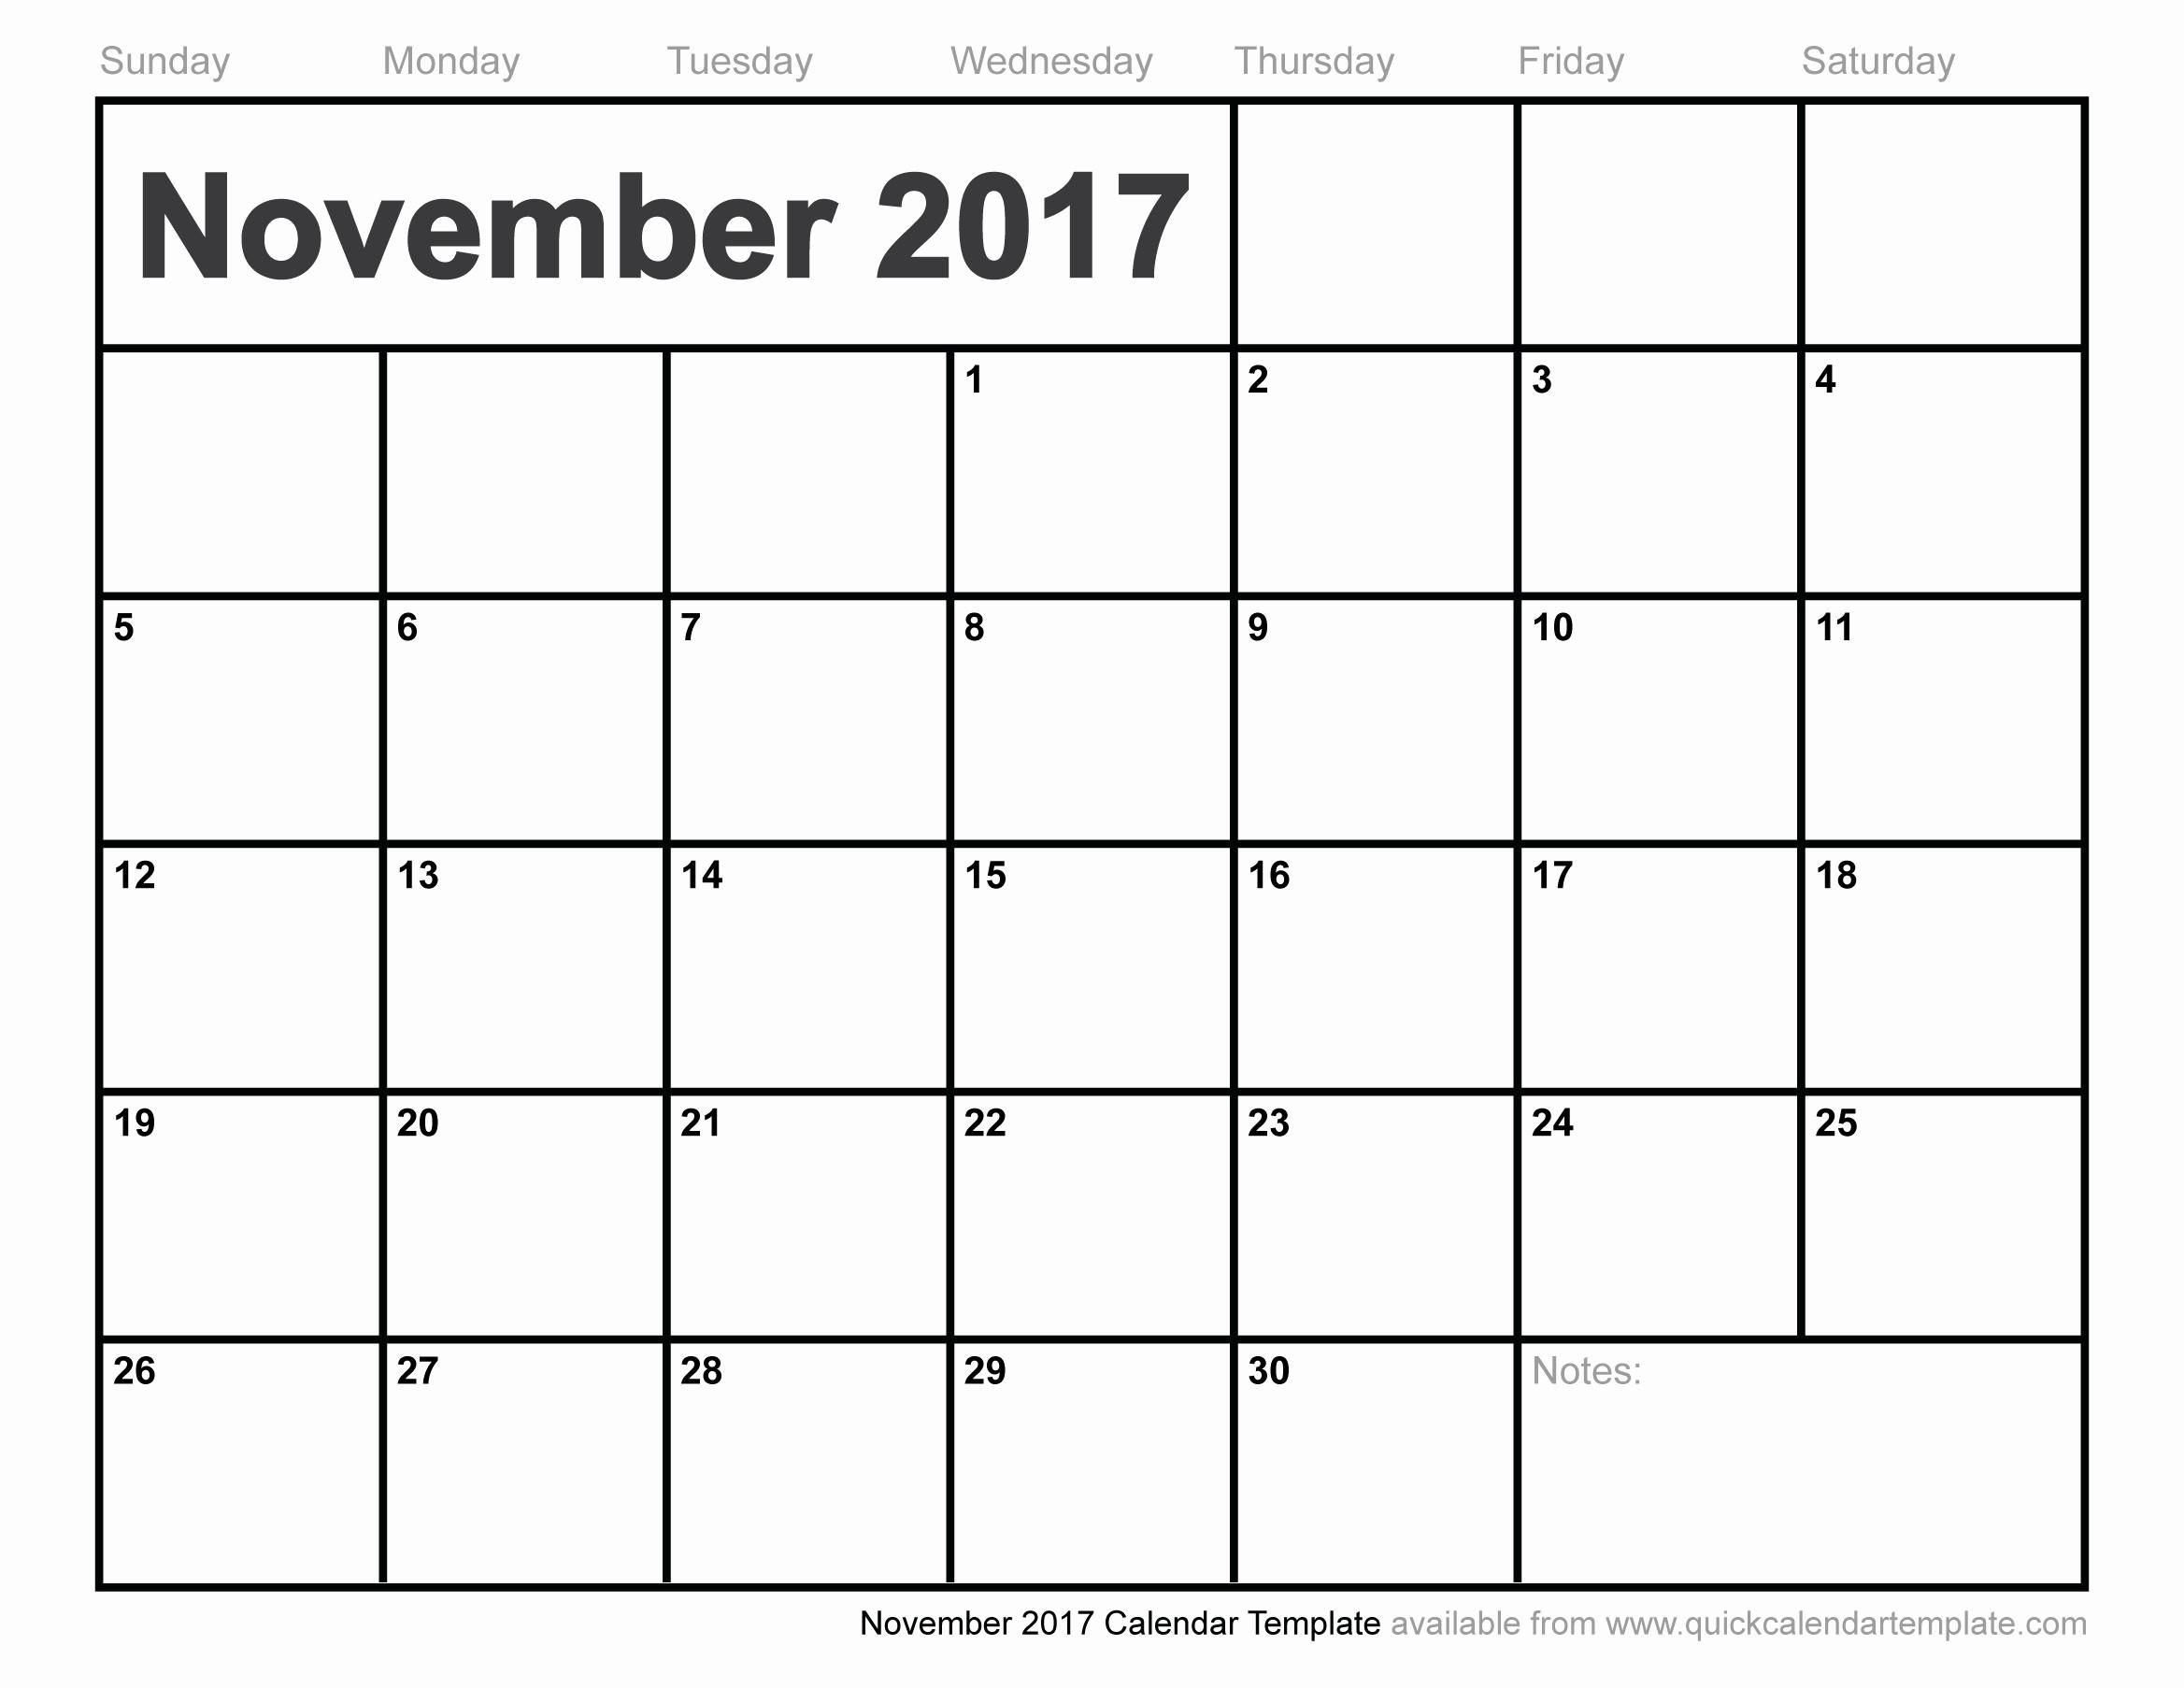 New Free Printable November 2017 Calendar With Holidays Classy World